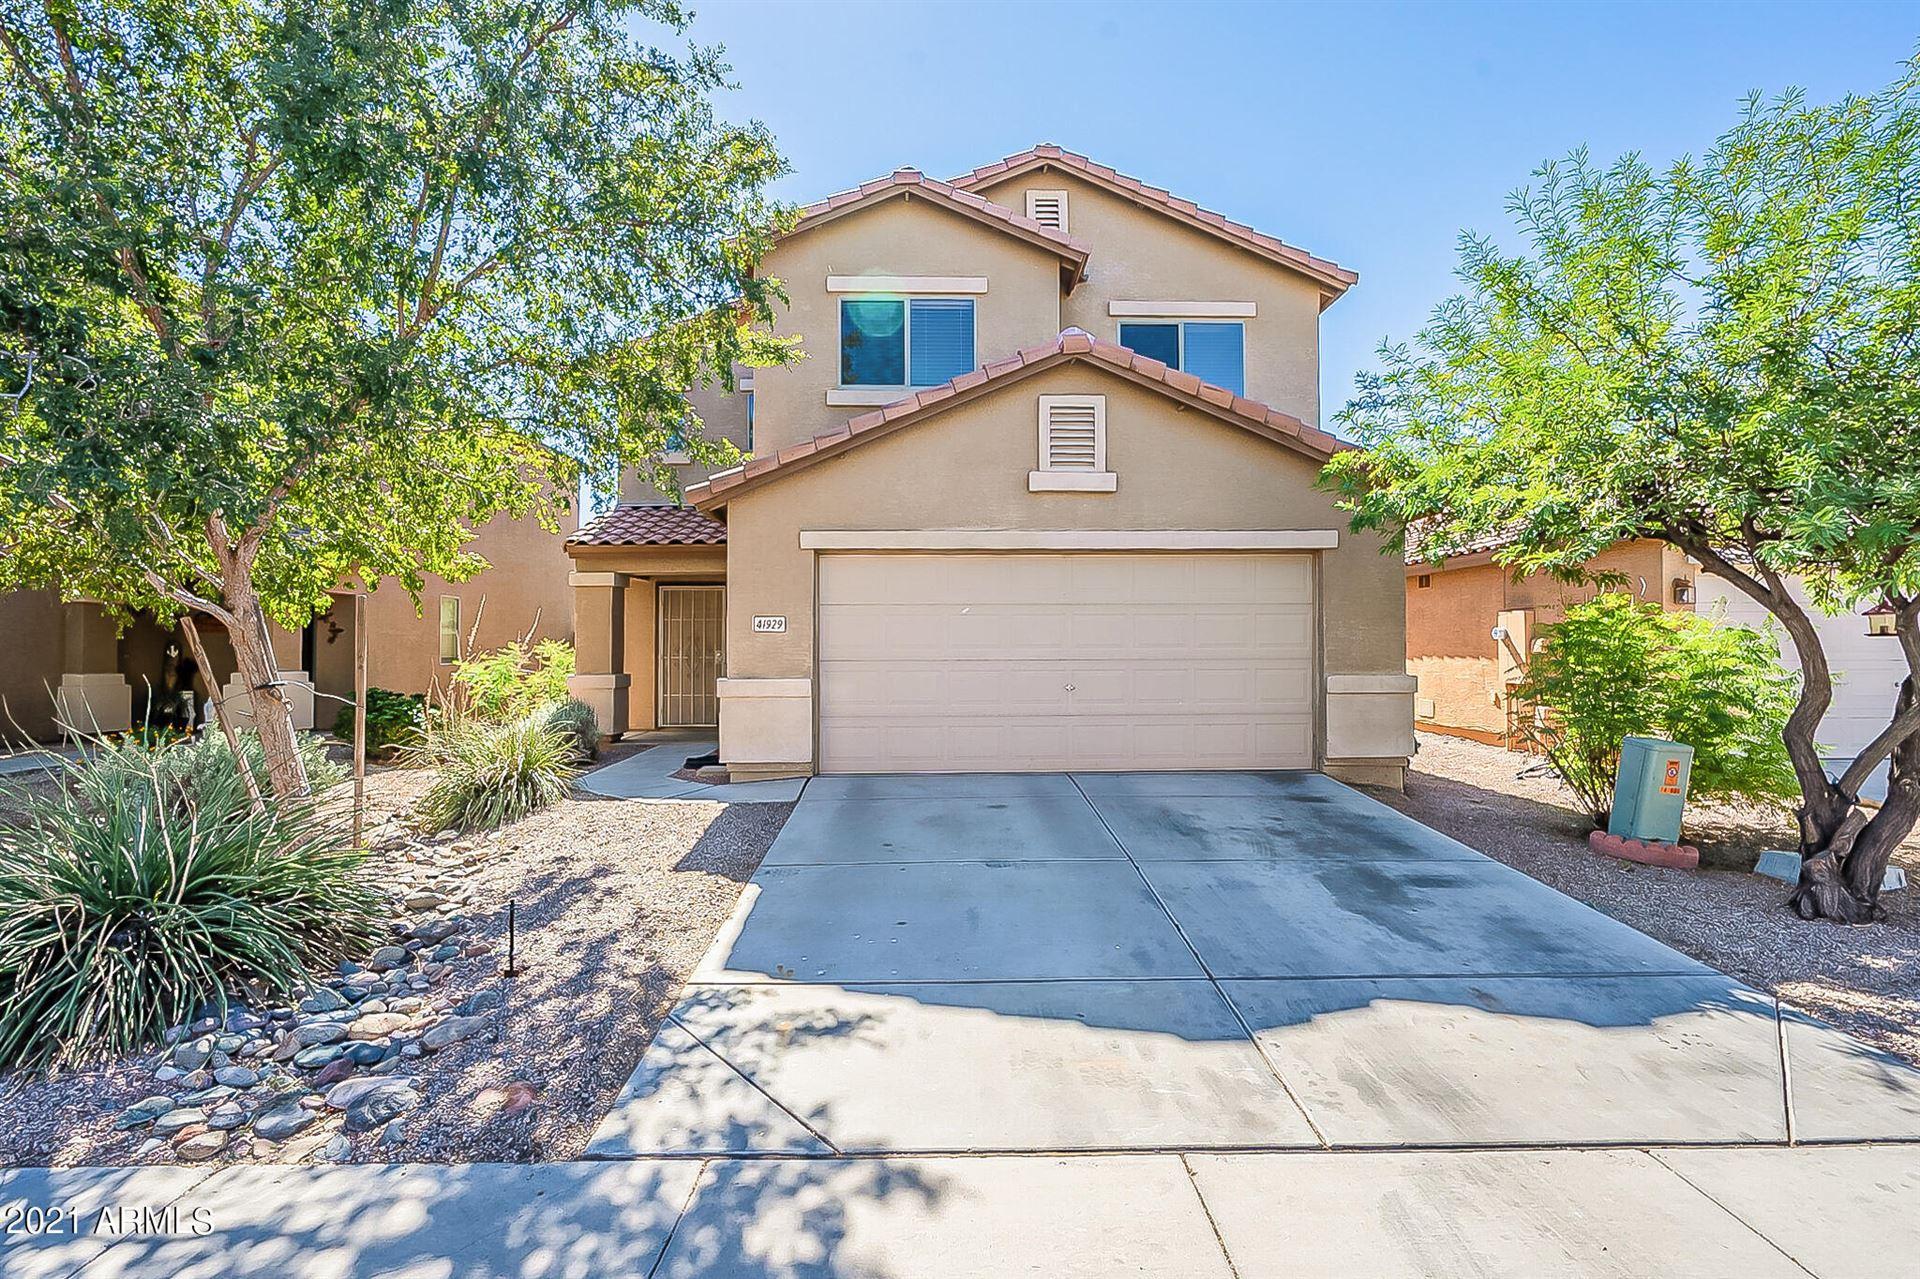 Photo of 41929 W HILLMAN Drive, Maricopa, AZ 85138 (MLS # 6305927)